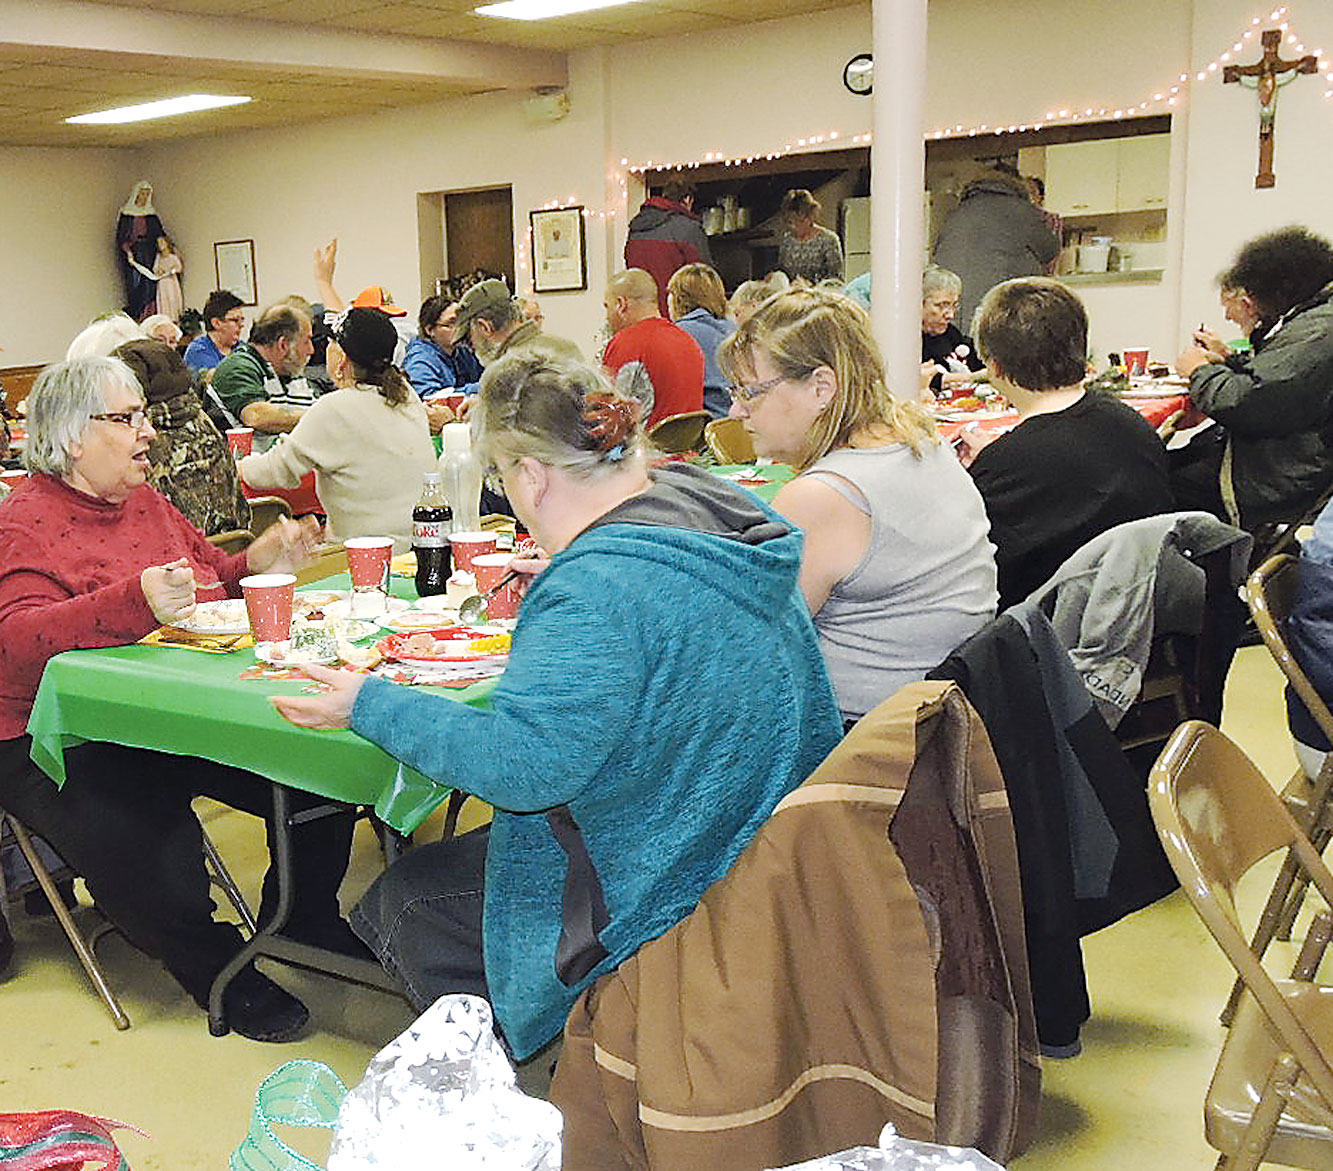 A Soup Kitchen Christmas | News, Sports, Jobs - Minot Daily News